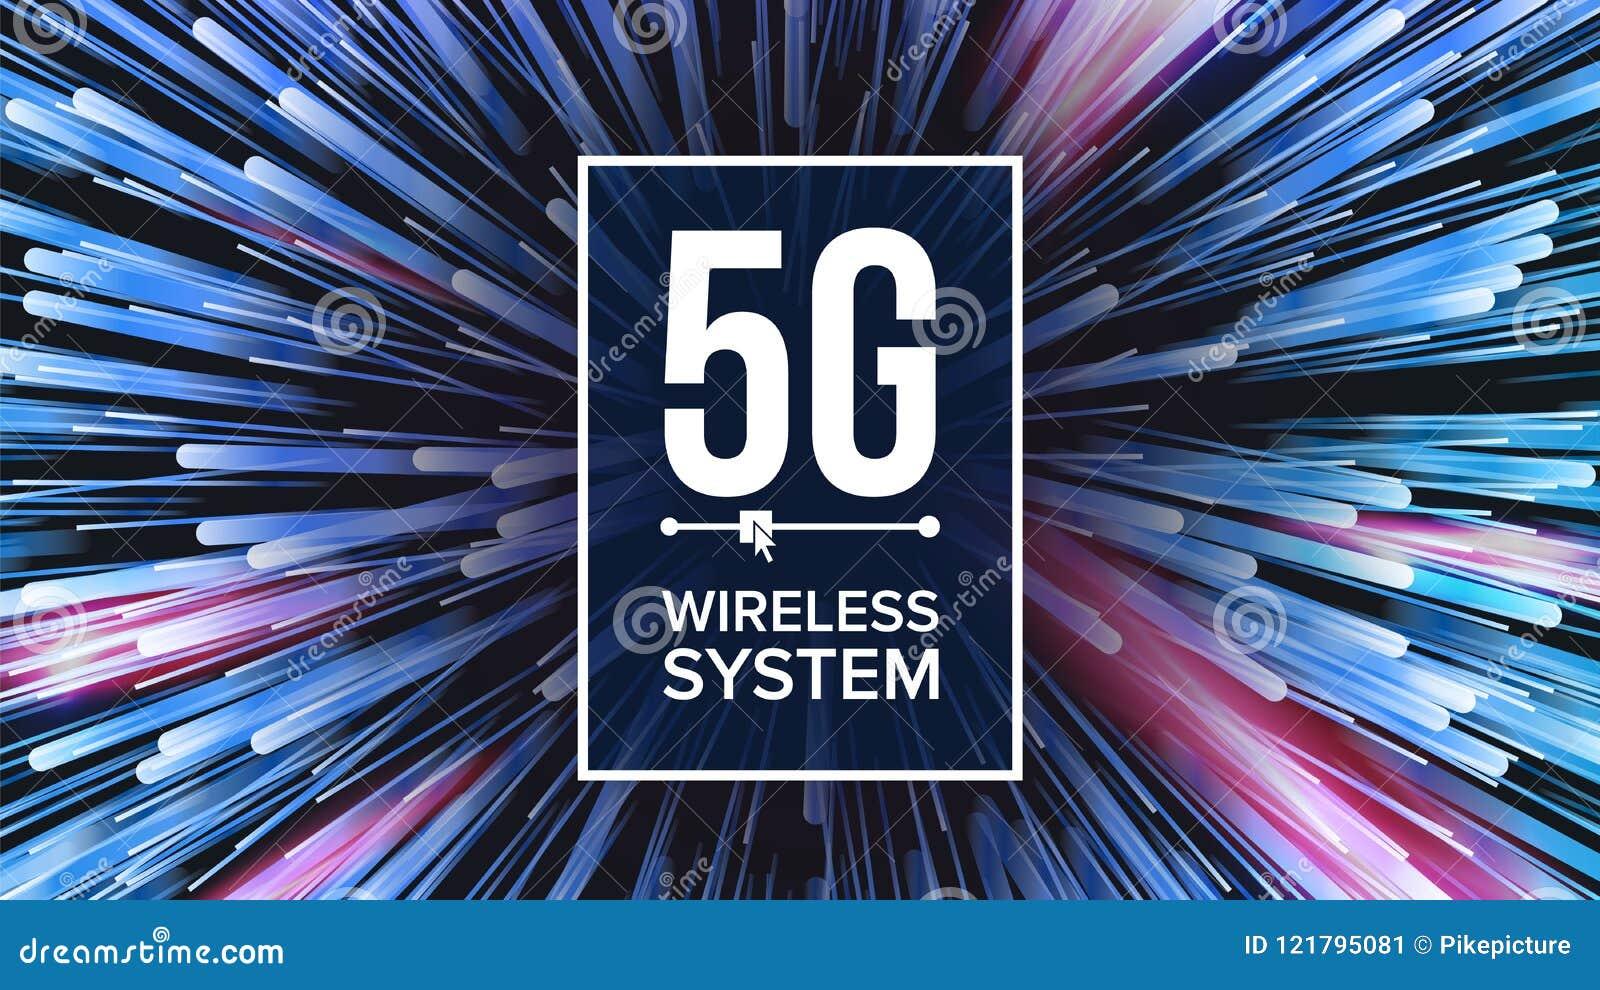 5G τυποποιημένο διάνυσμα υποβάθρου της WI-Fi Πέντε, 5η παραγωγή Μετάδοση σημάτων σύνδεση καινοτομίας υψηλής ταχύτητας Μέλλον